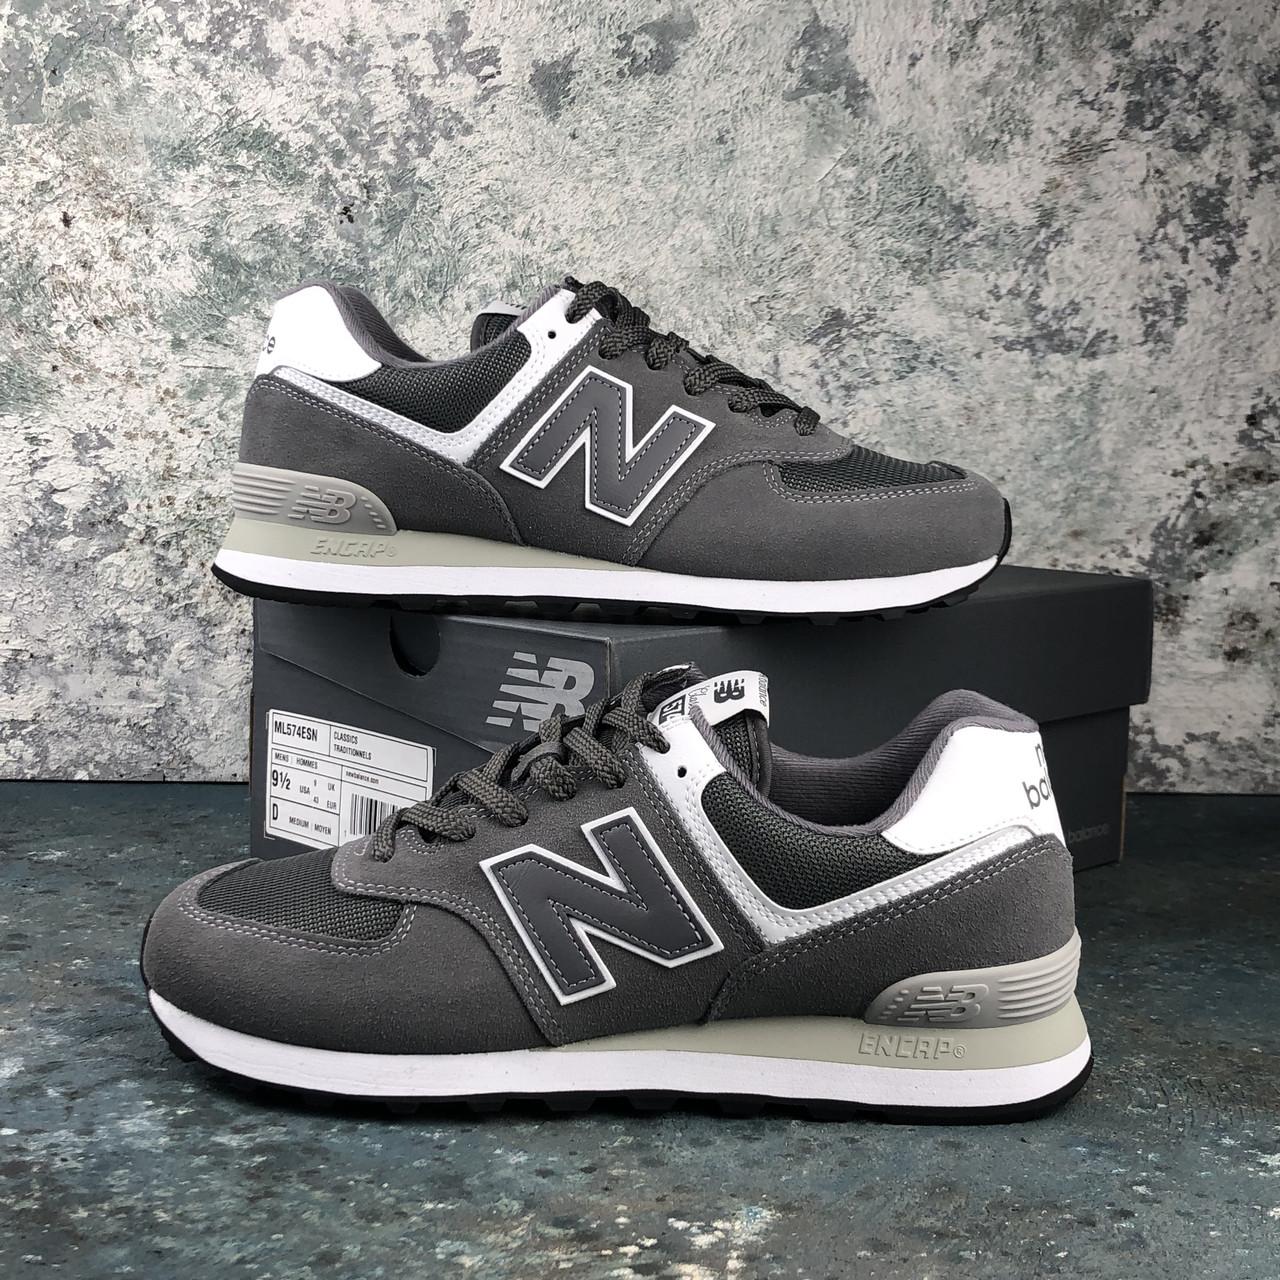 Мужские кроссовки New Balance 574 Grey ML574ESN. Оригинал. Замша. Подошва резина, фото 1